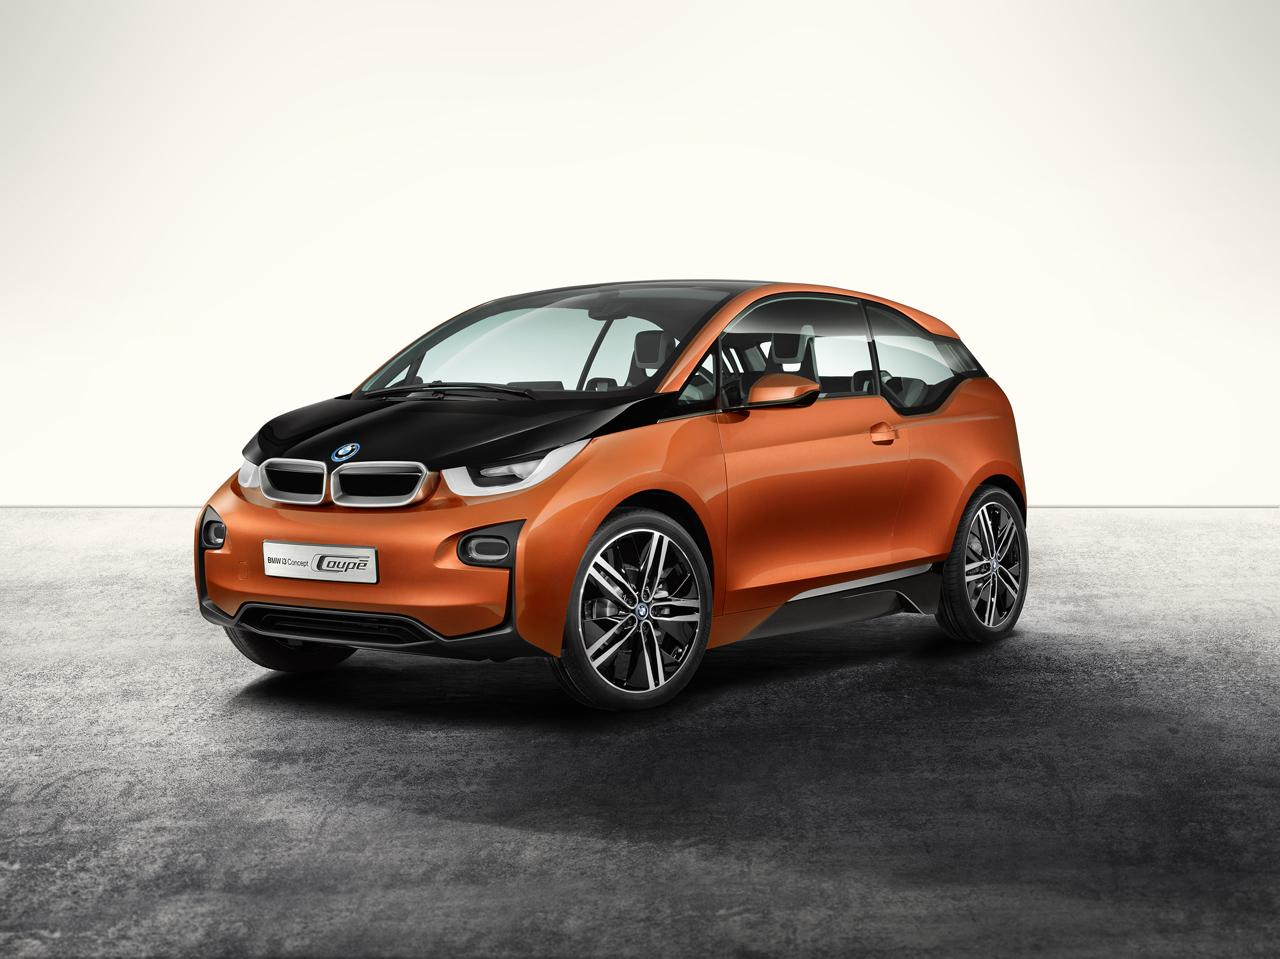 [Resim: BMW+i3+Coup%C3%A9+1.jpg]